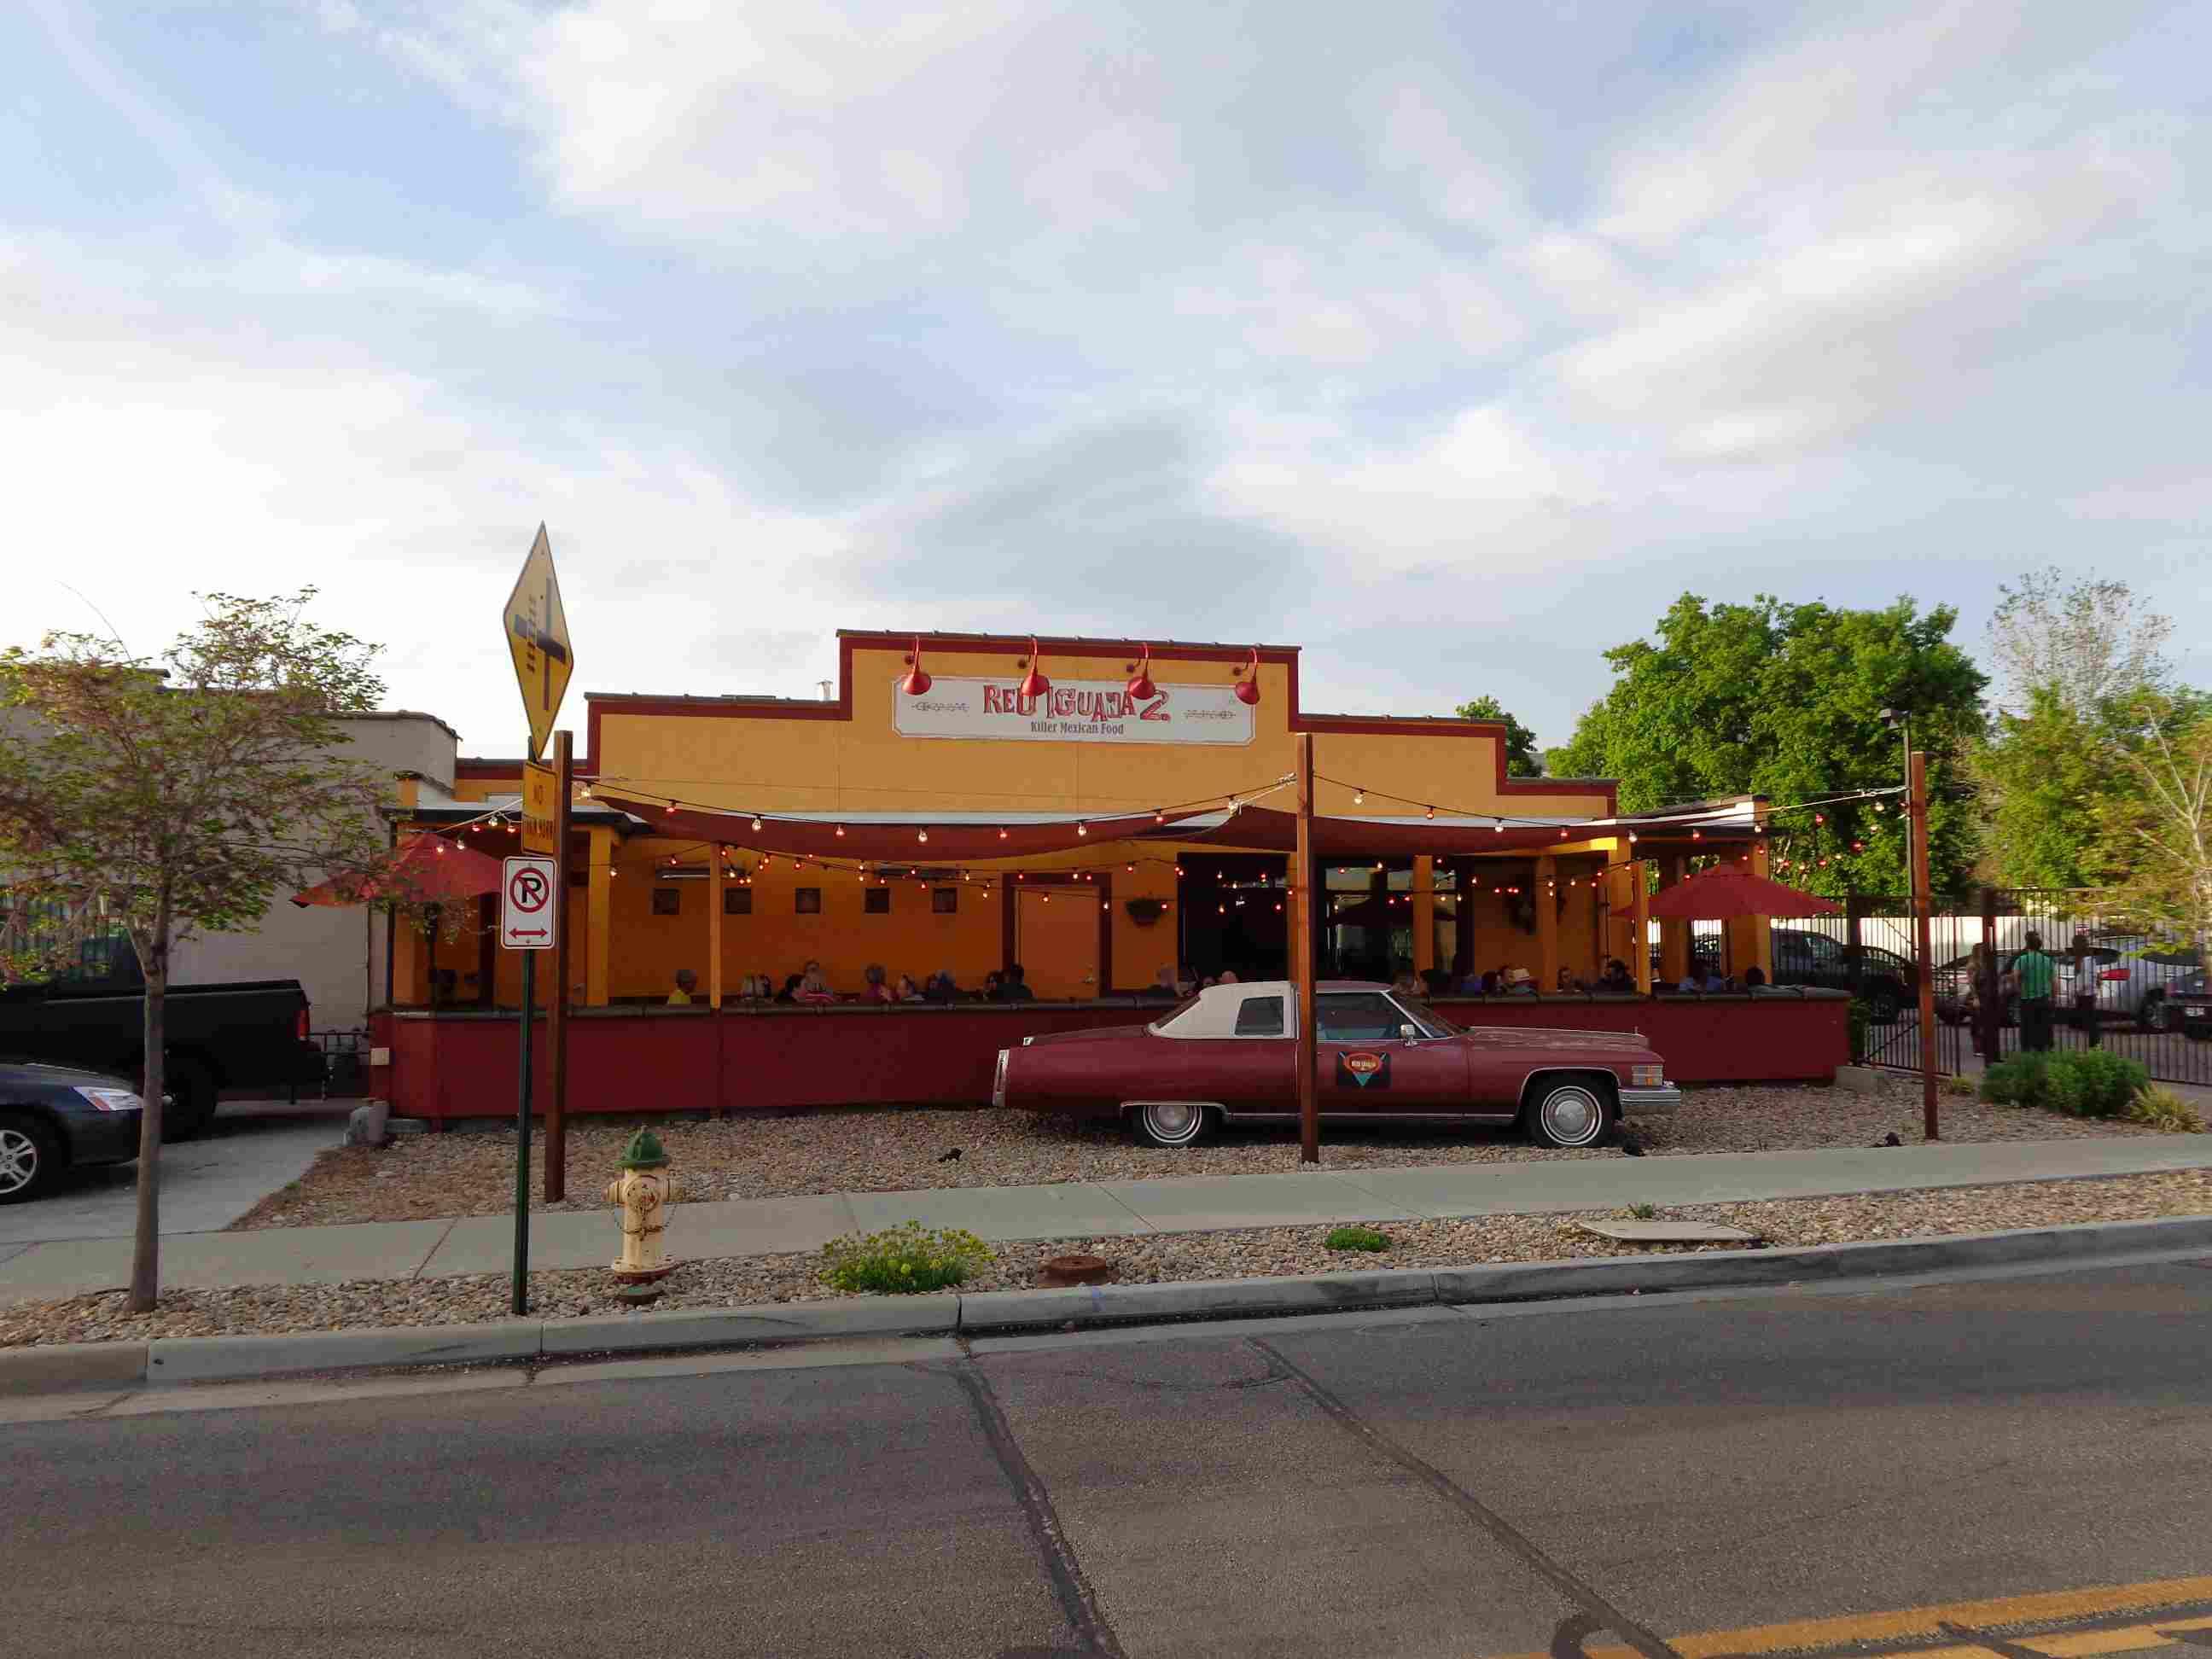 Red Iguana Restaurant in Salt Lake City